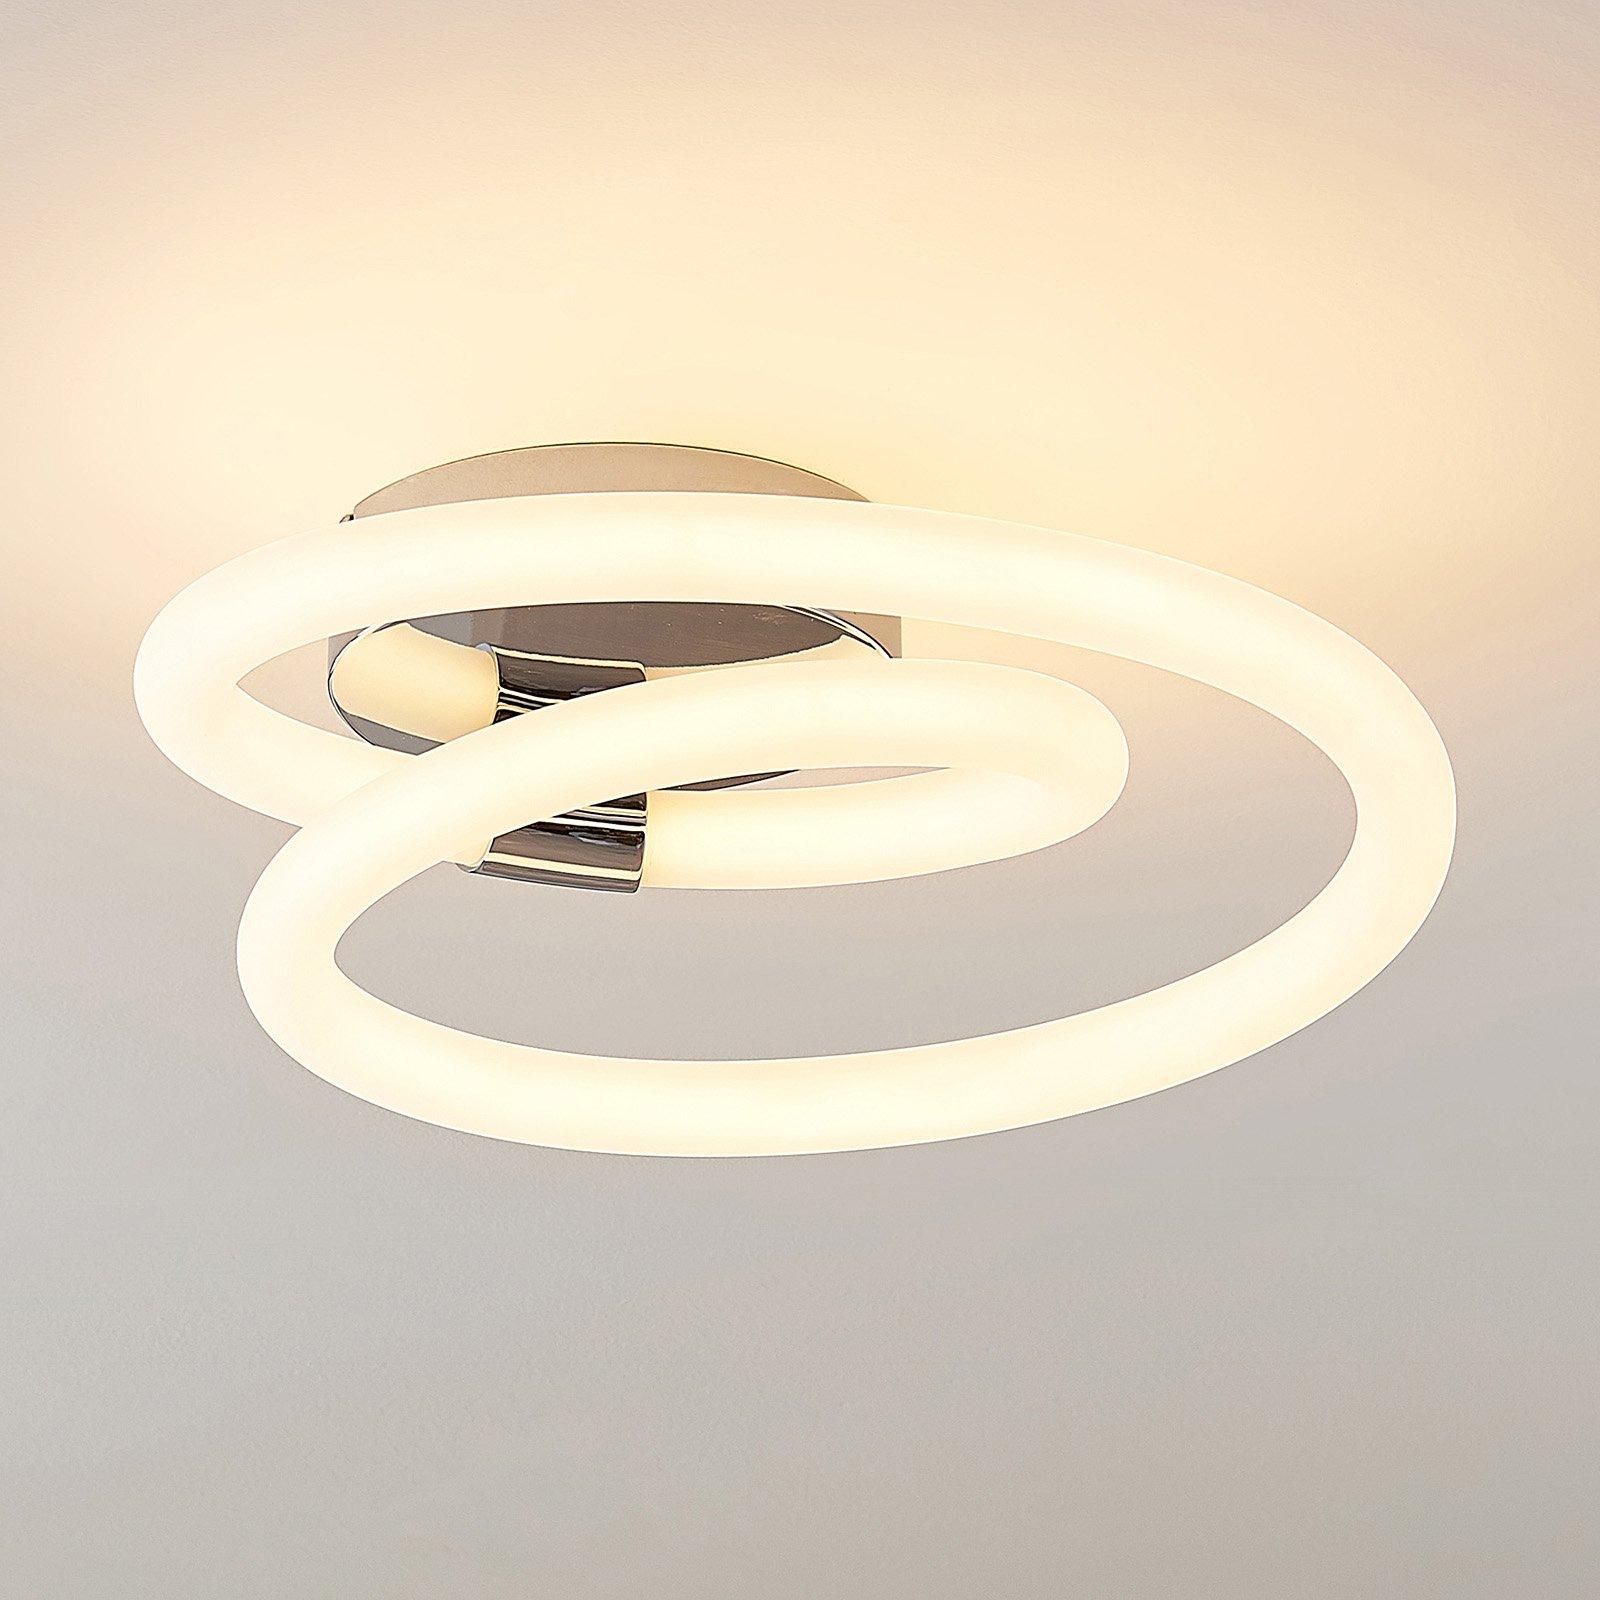 Lucande Lumka LED-vegglampe i krom